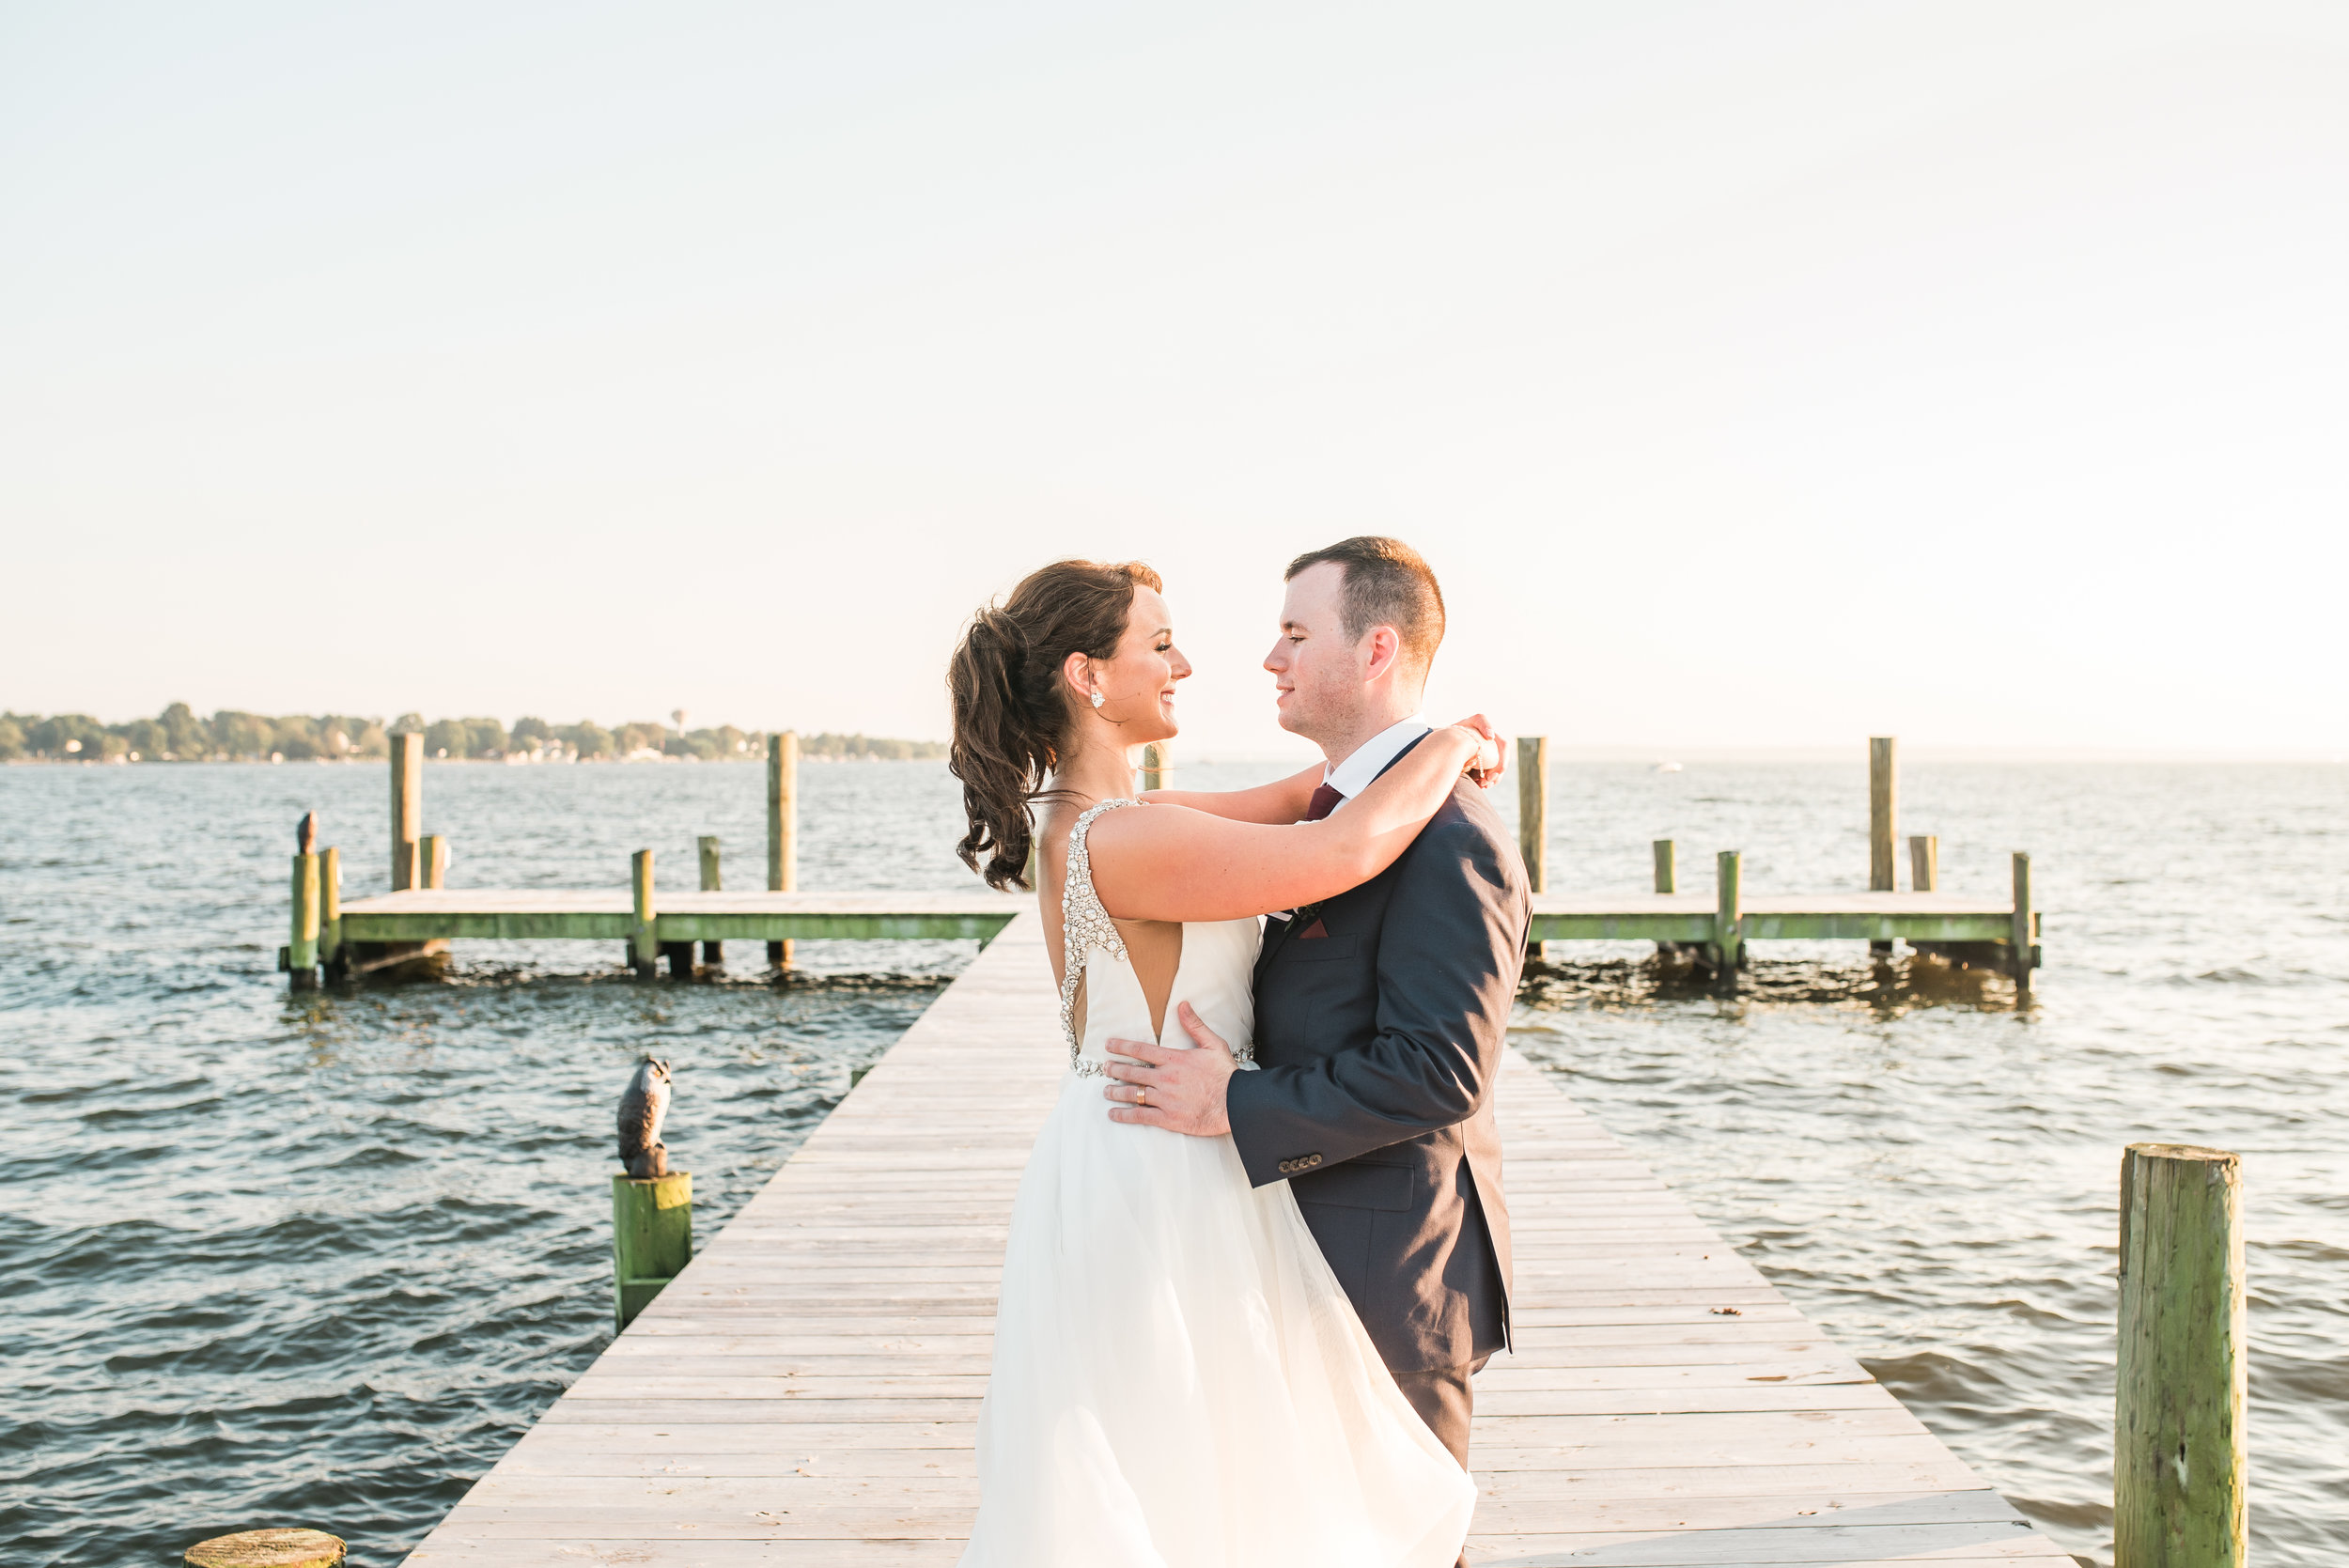 odom-wedding-433.jpg